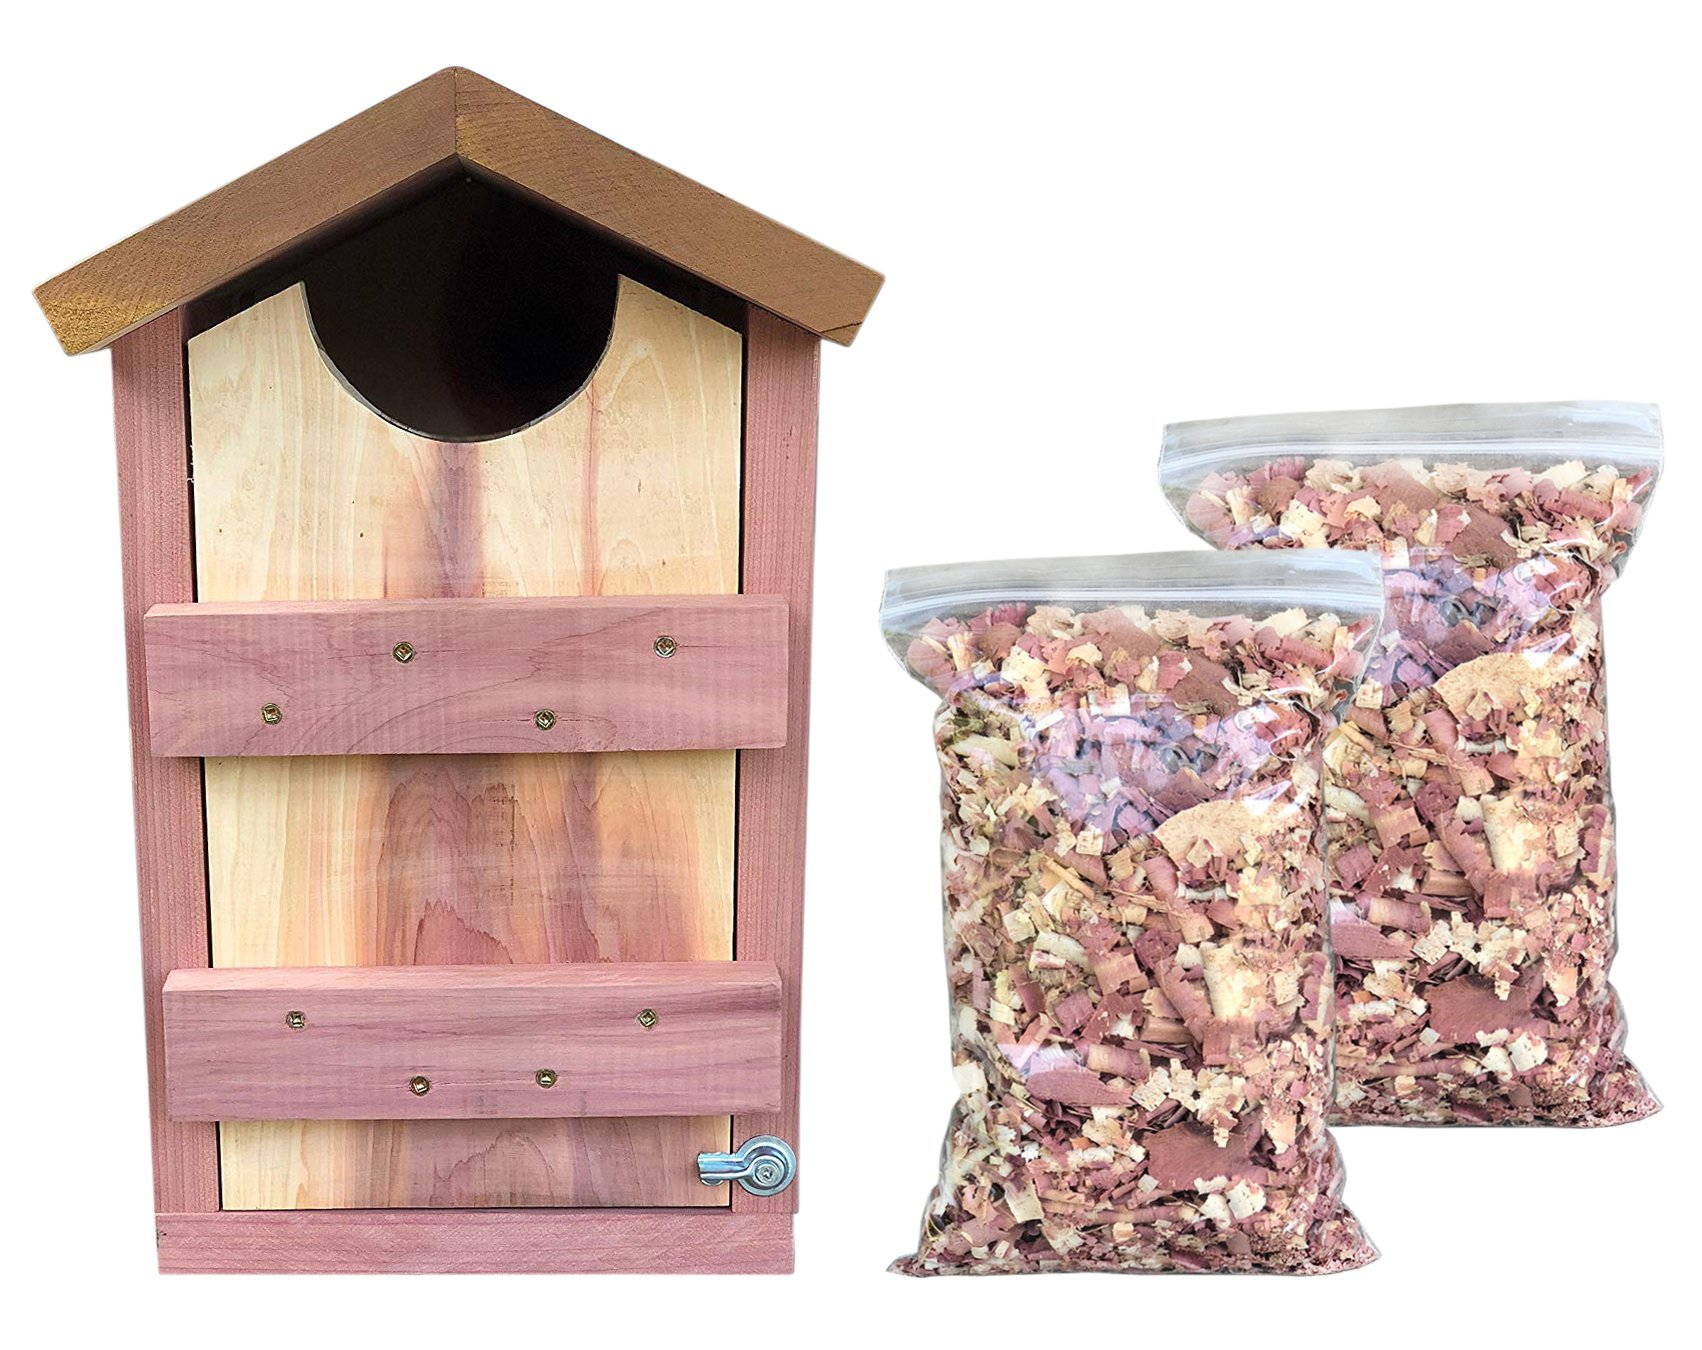 Vundahboah Amish Goods Screech Owl House Box for Nesting- Handmade in USA- Solid Cedar Wood Saw-Whet/Kestrel/Screech Owl/Flicker- Cedar Shavings Included